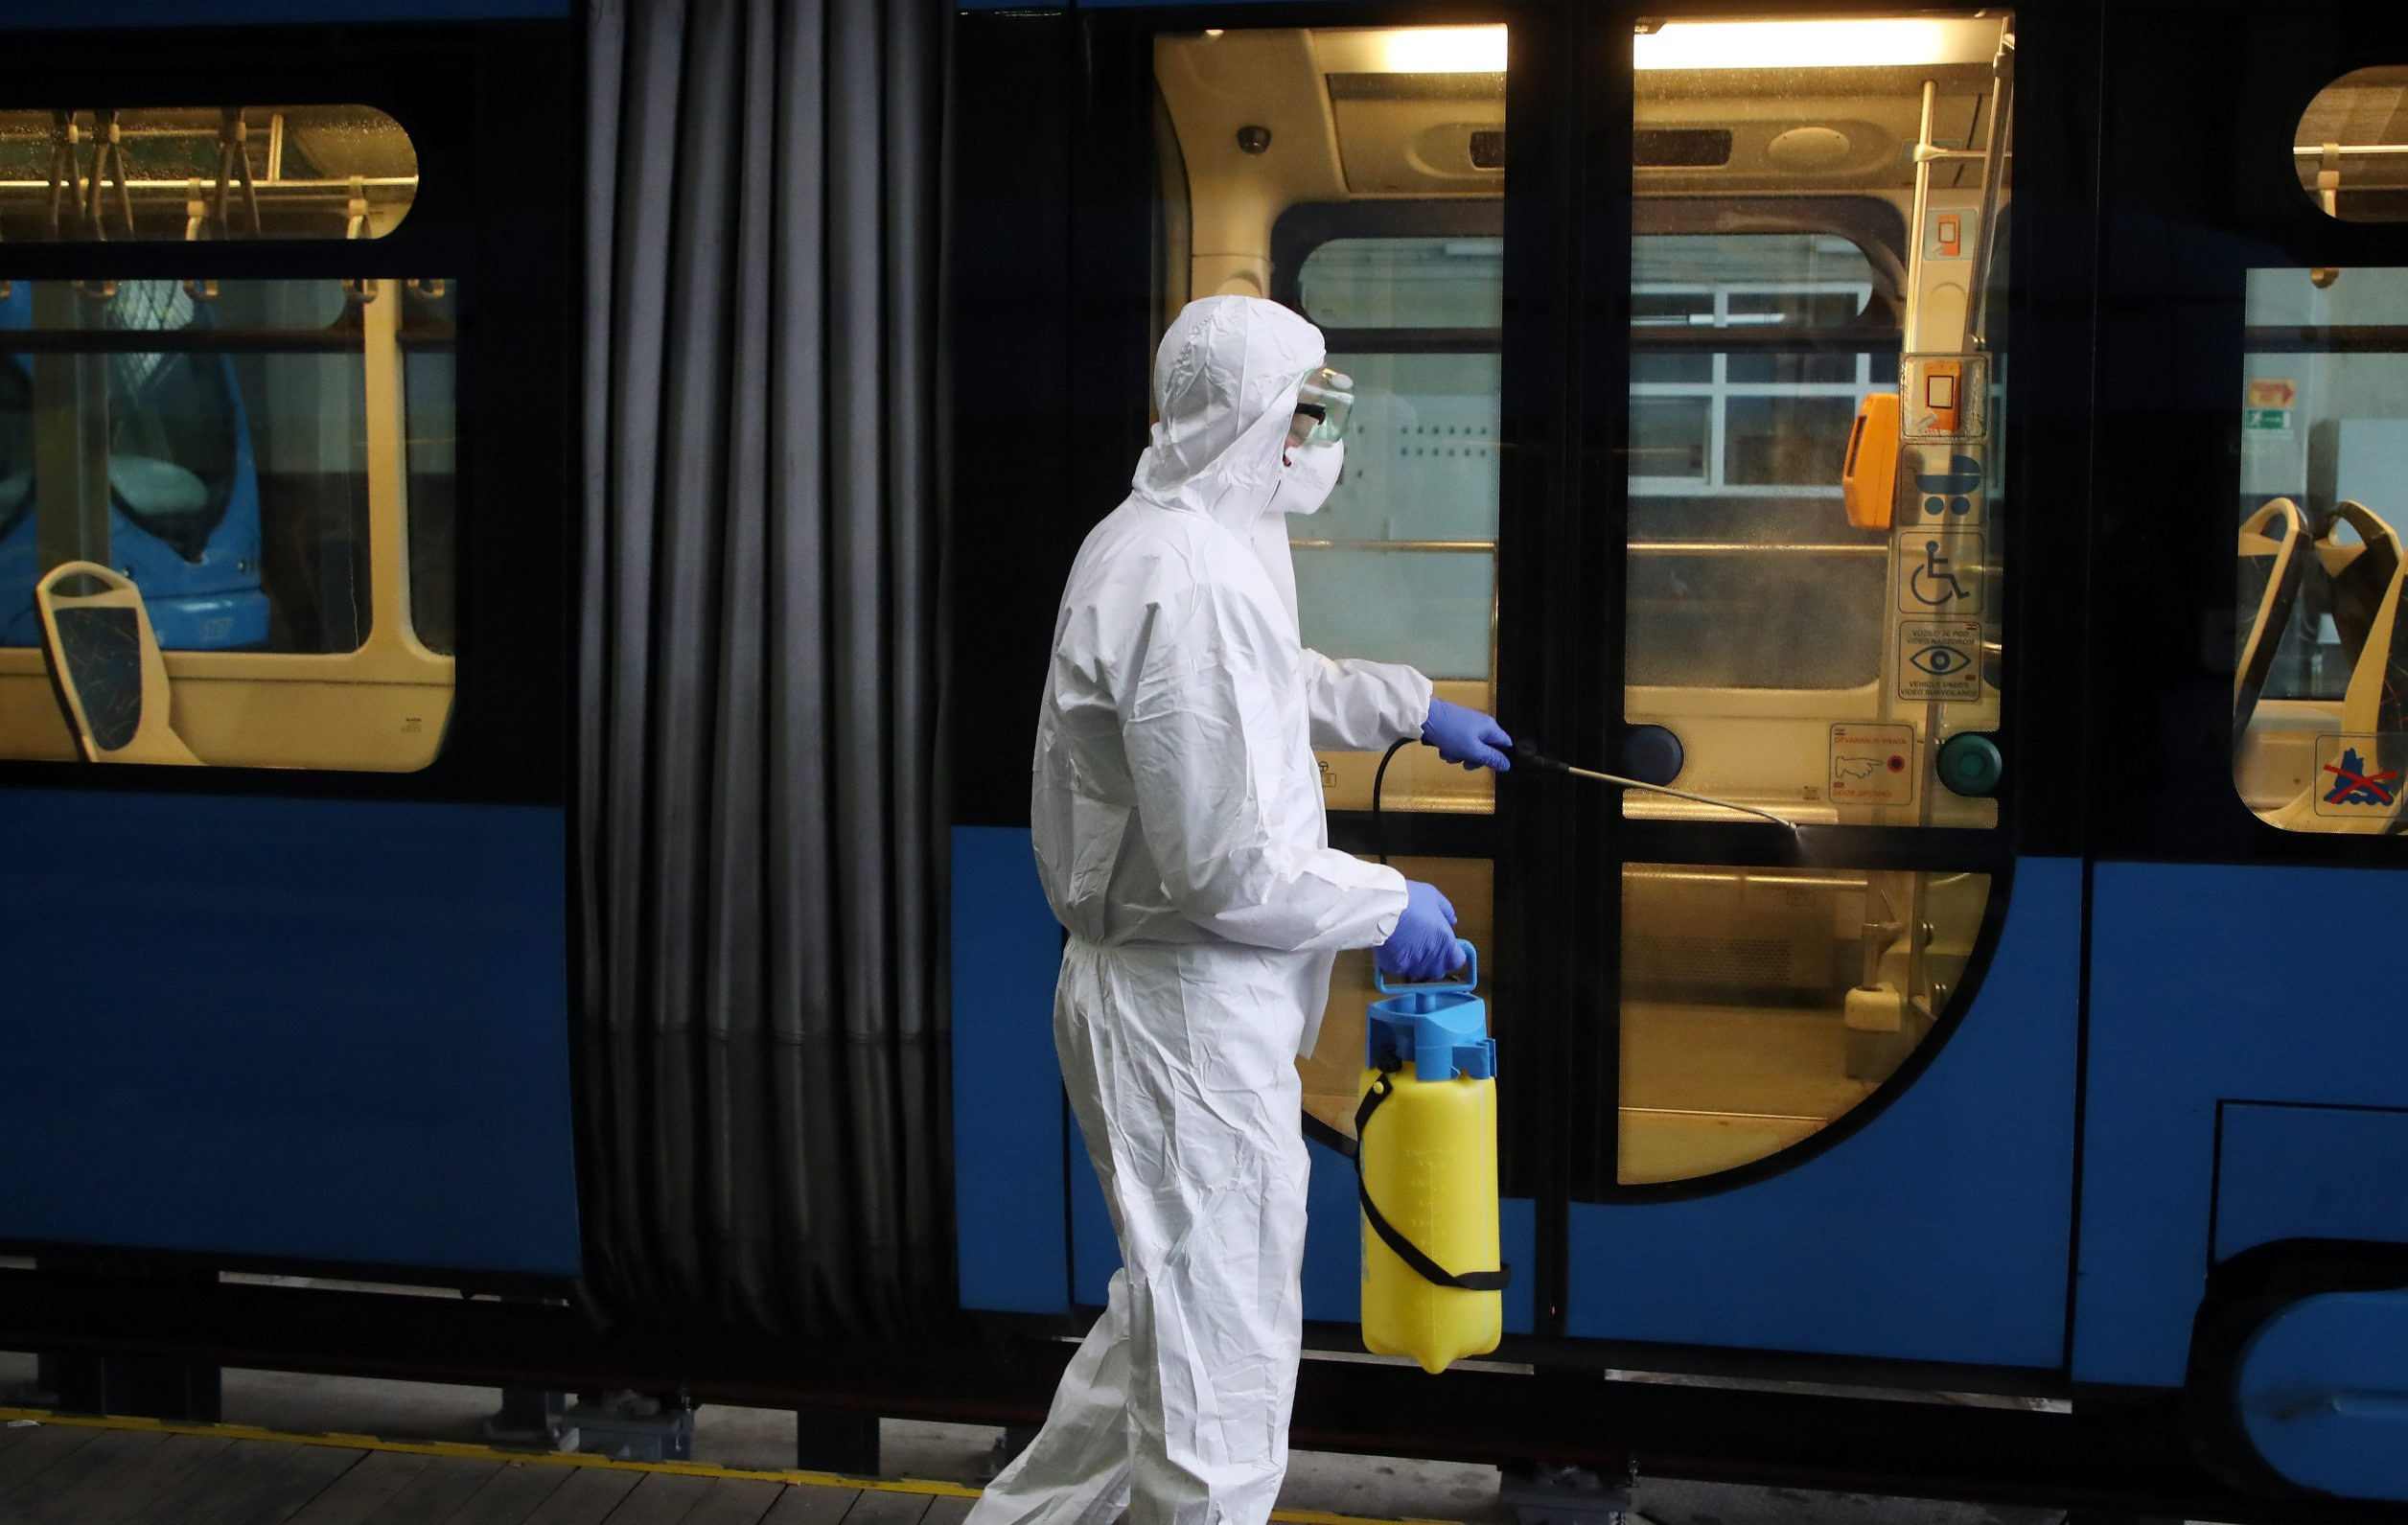 dezinfekcija_tramvaja1-130320